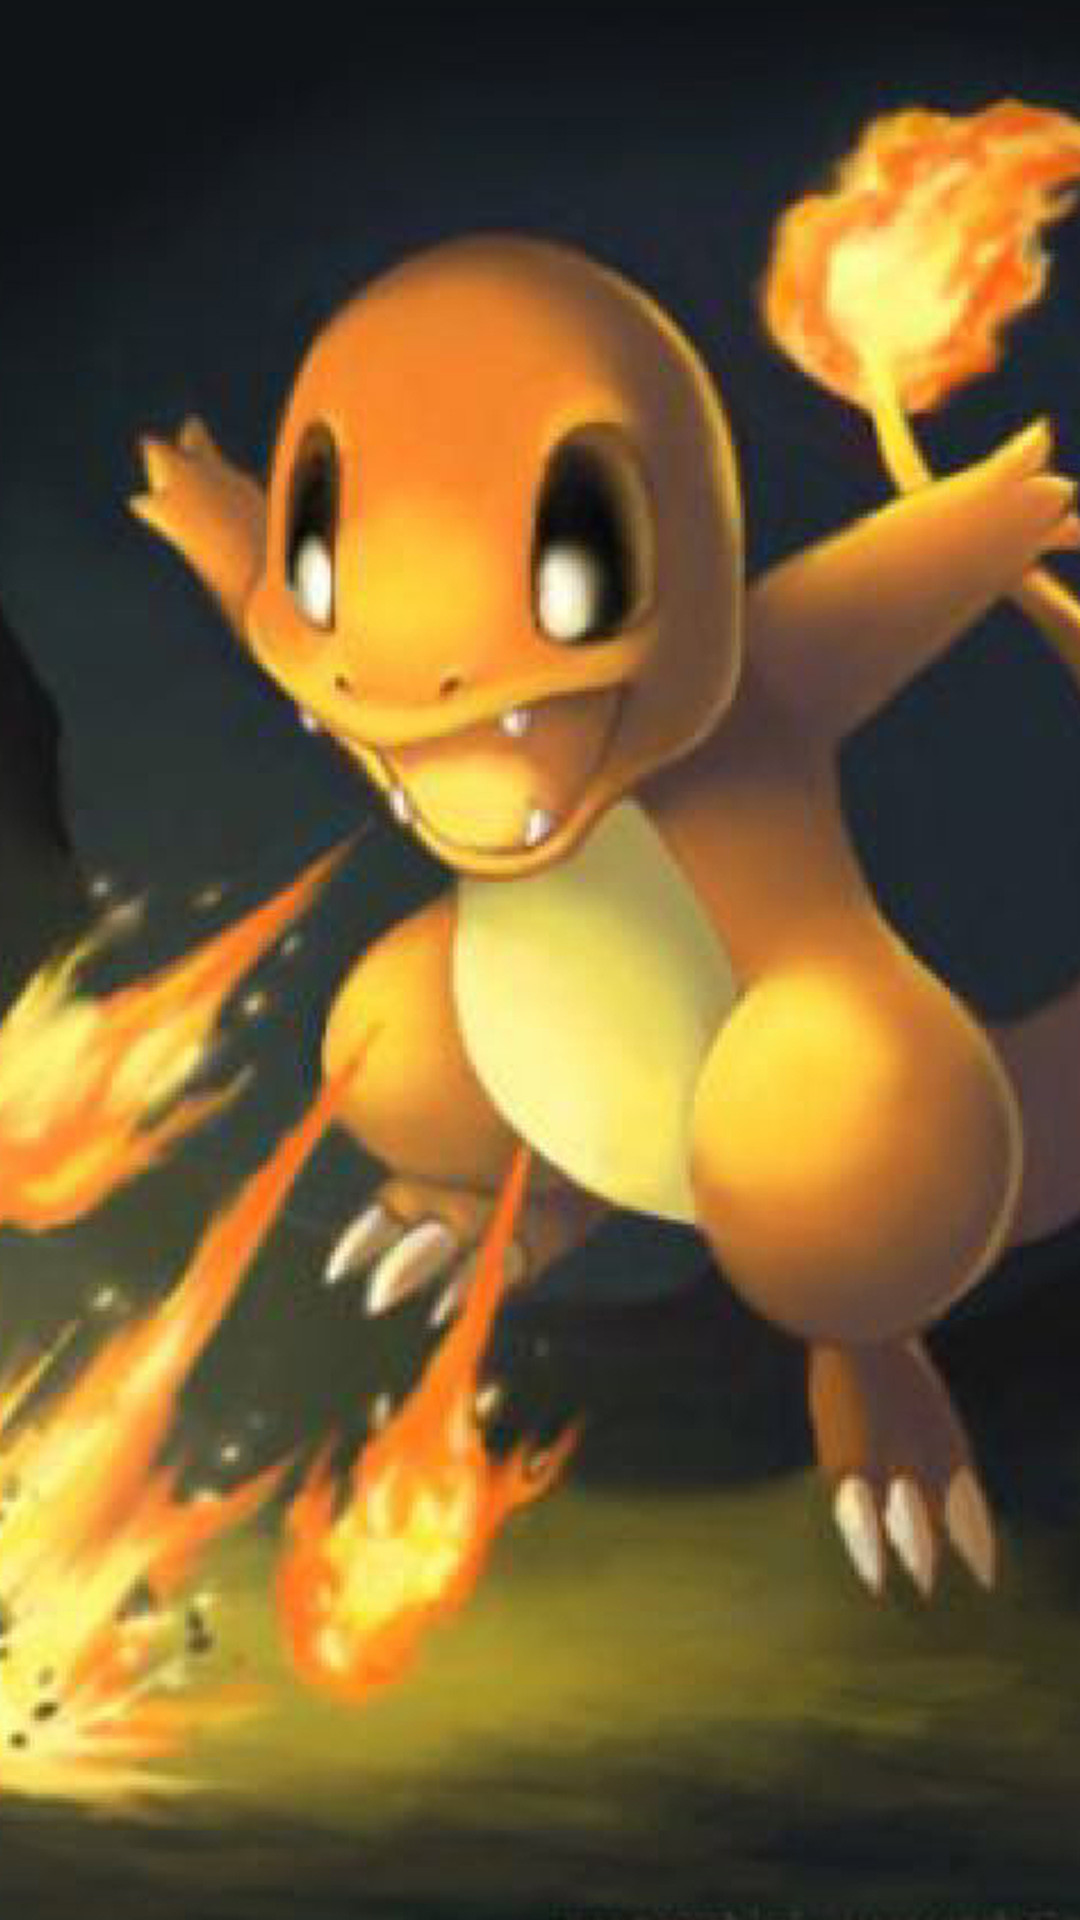 Charmander Pokemon Go iphone 7 wallpaper hd